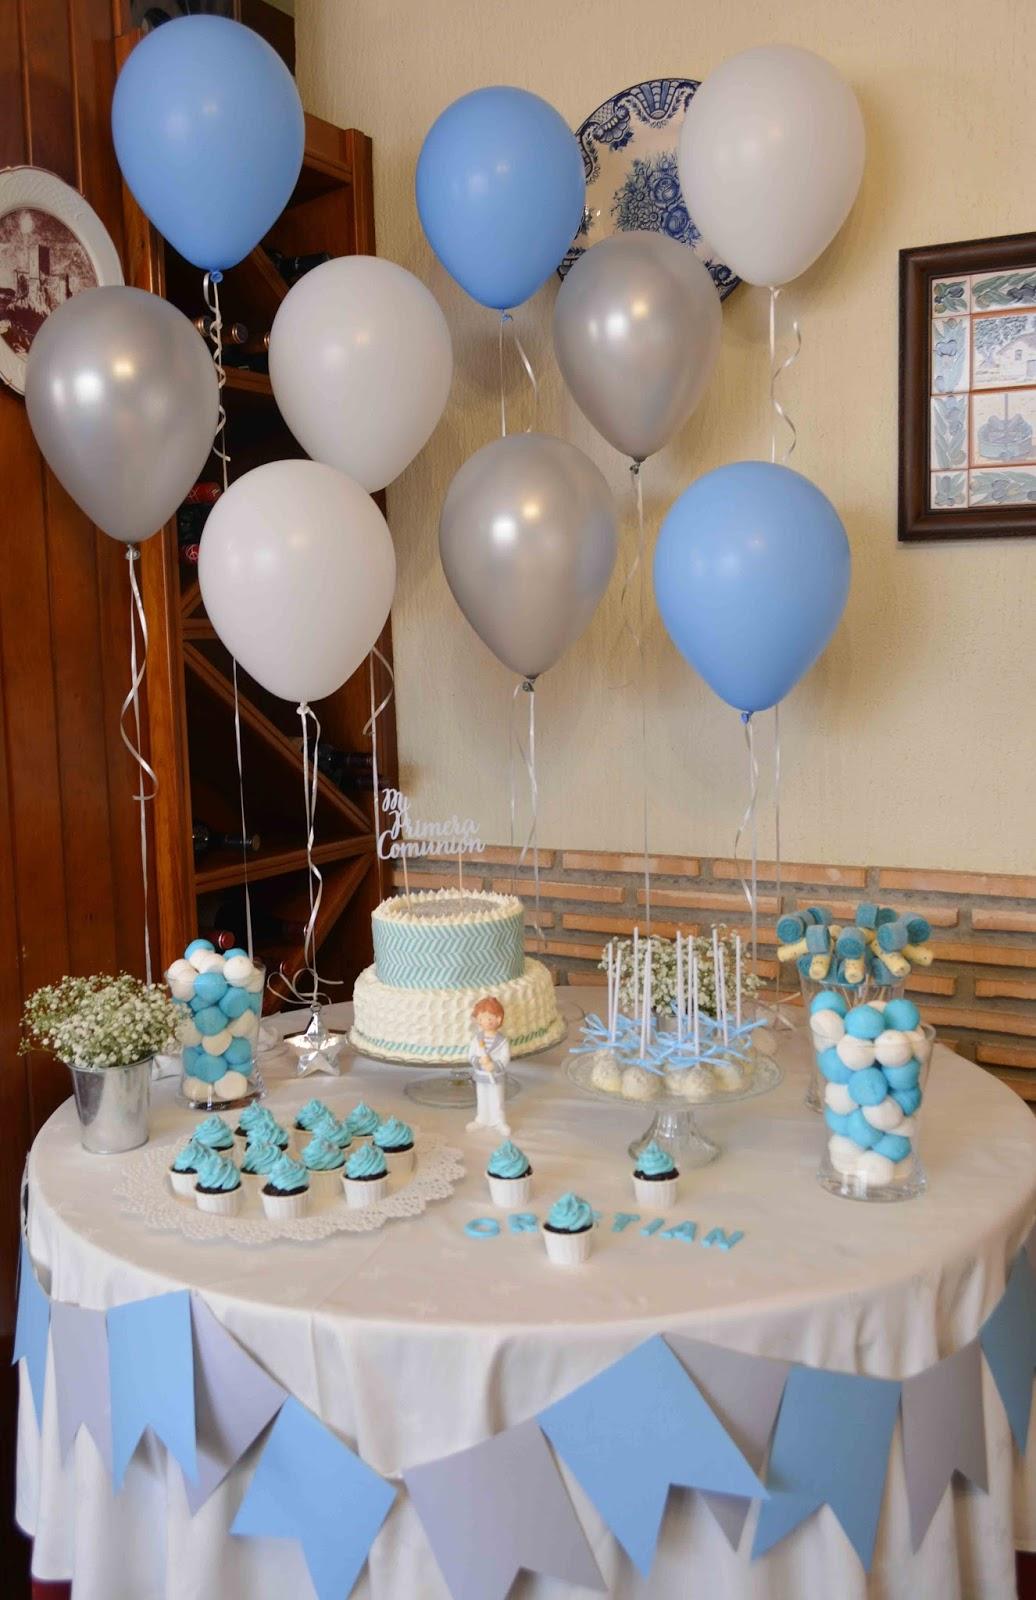 Sugartam blog de postres mesa dulce de comuni n - Preparar mesa dulce para comunion ...